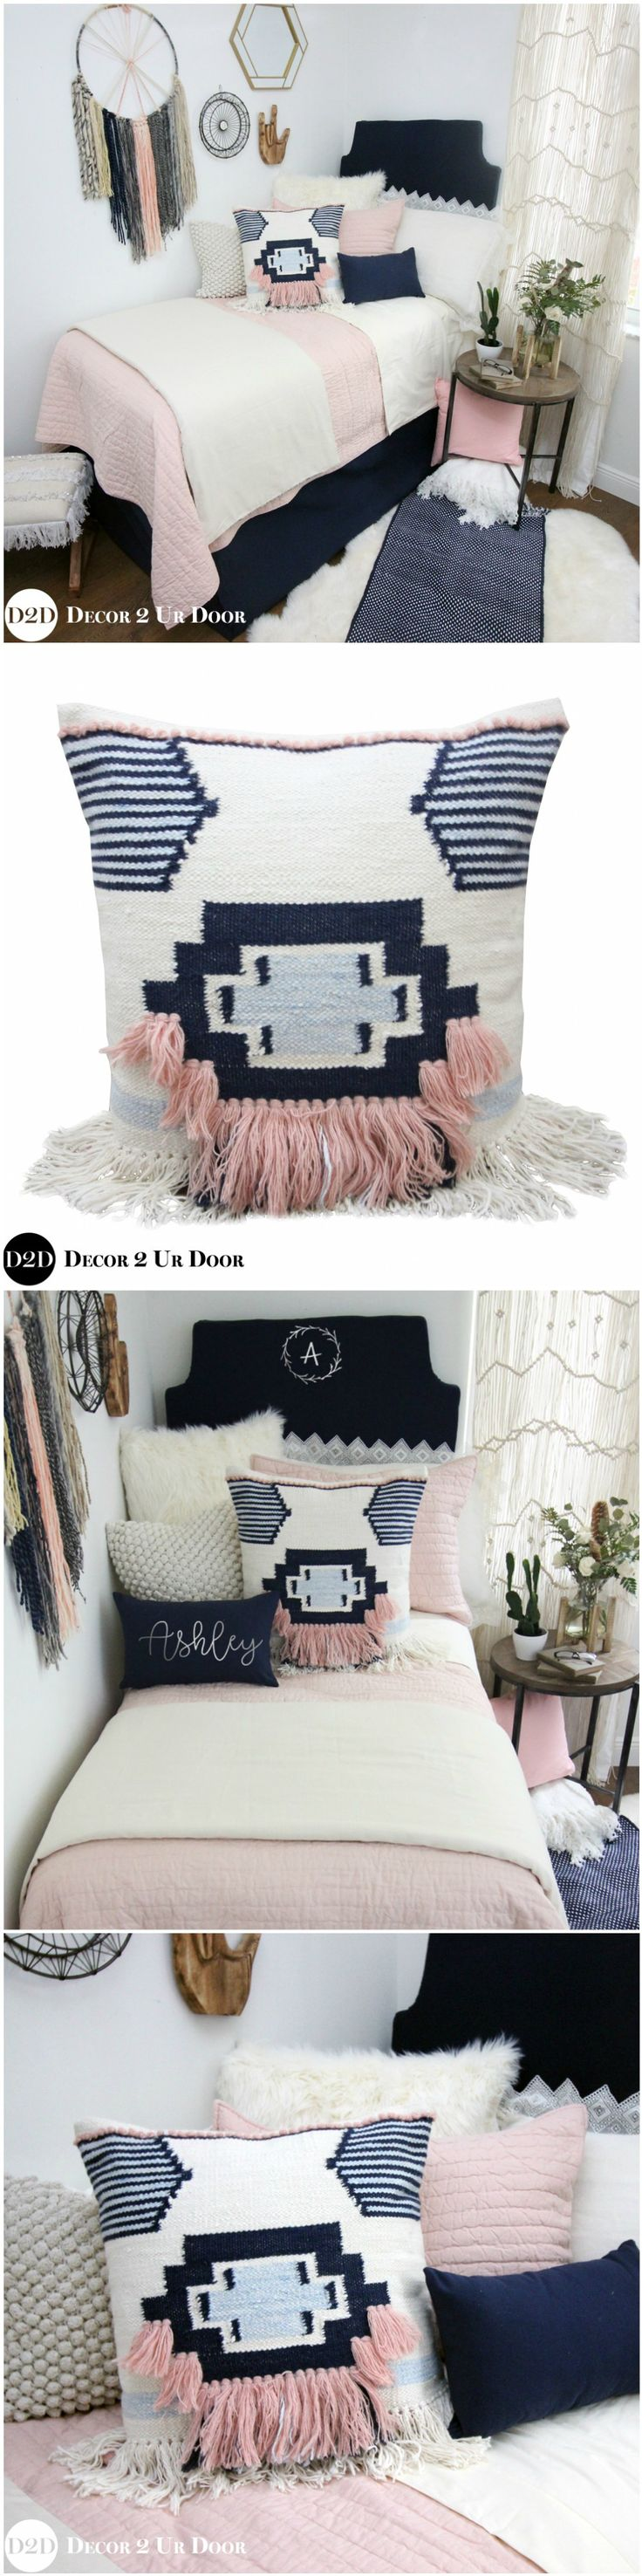 Vs pink bedding sets - We Are Swooning Over This Boho Vibe Dorm Bedding Our Best Selling Dorm Bedding Setspink